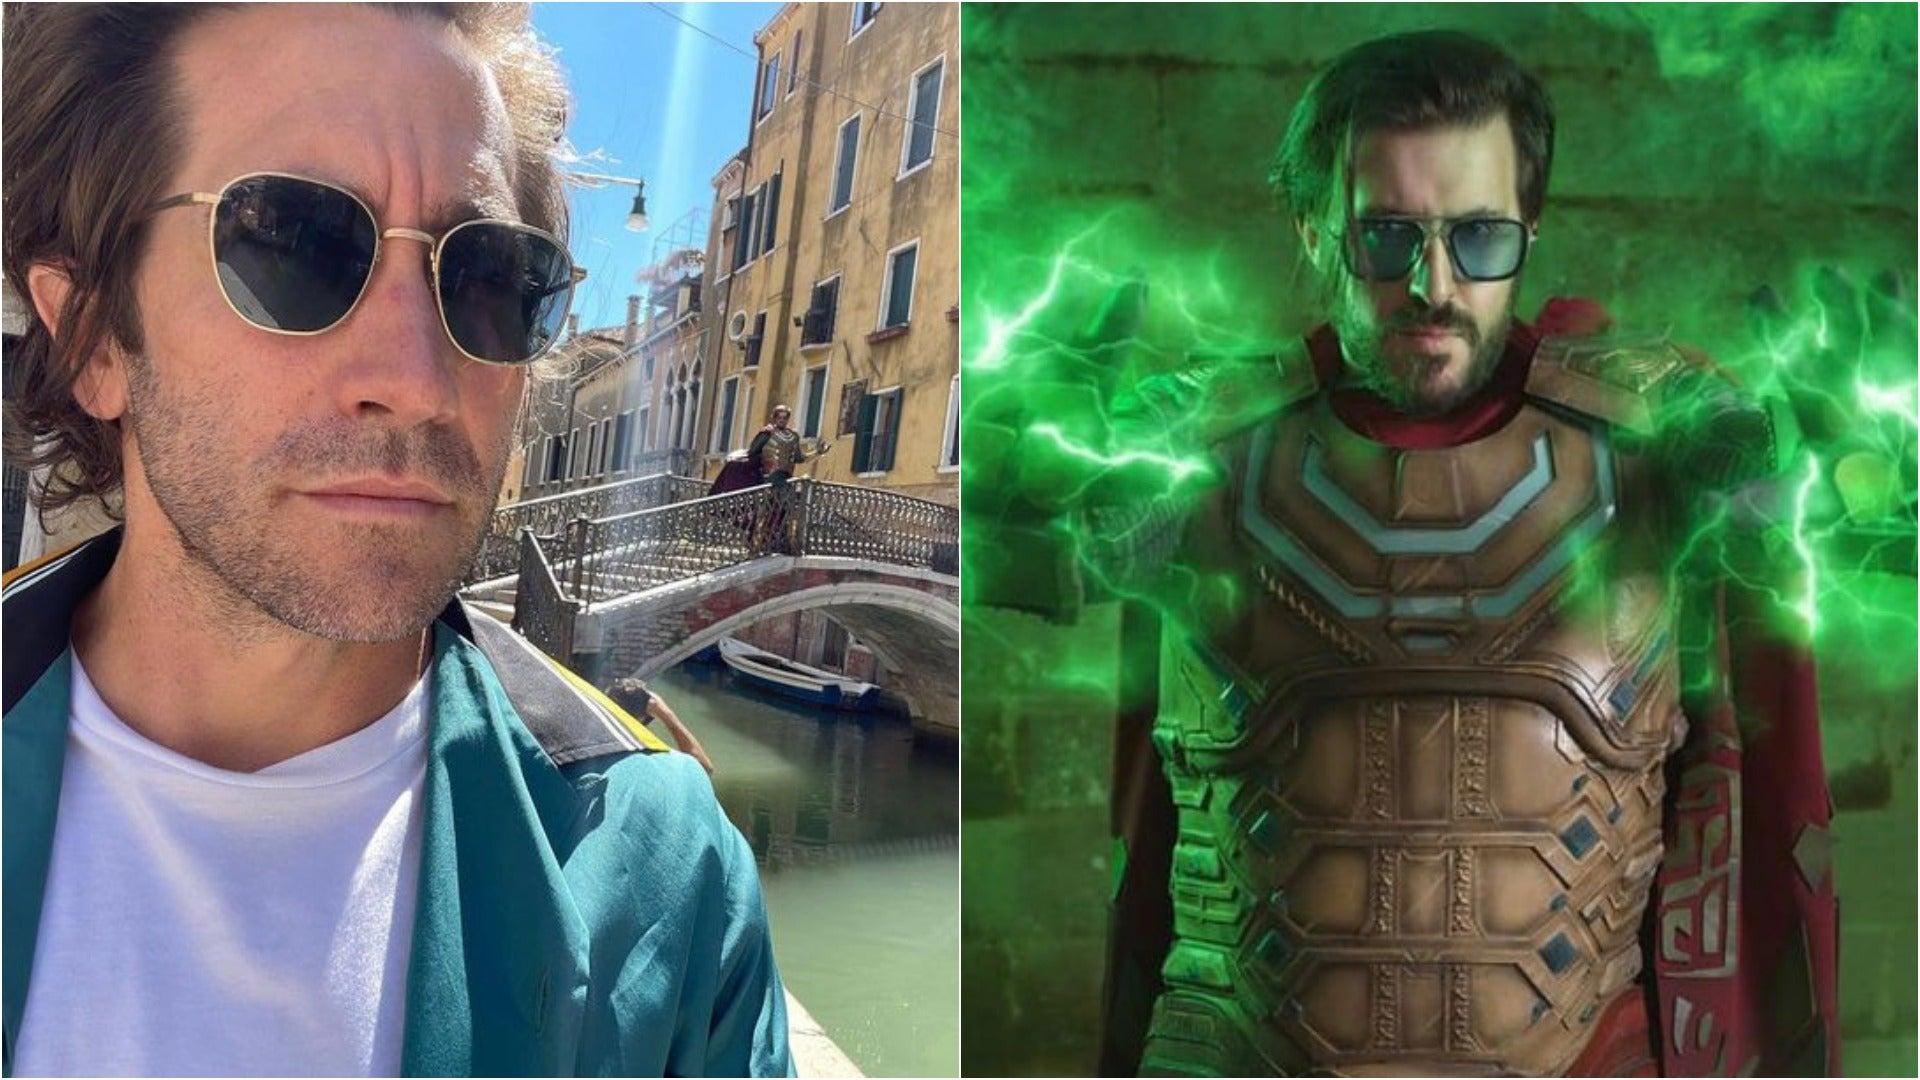 Mysterio & Jake Gyllenhaal in Venice